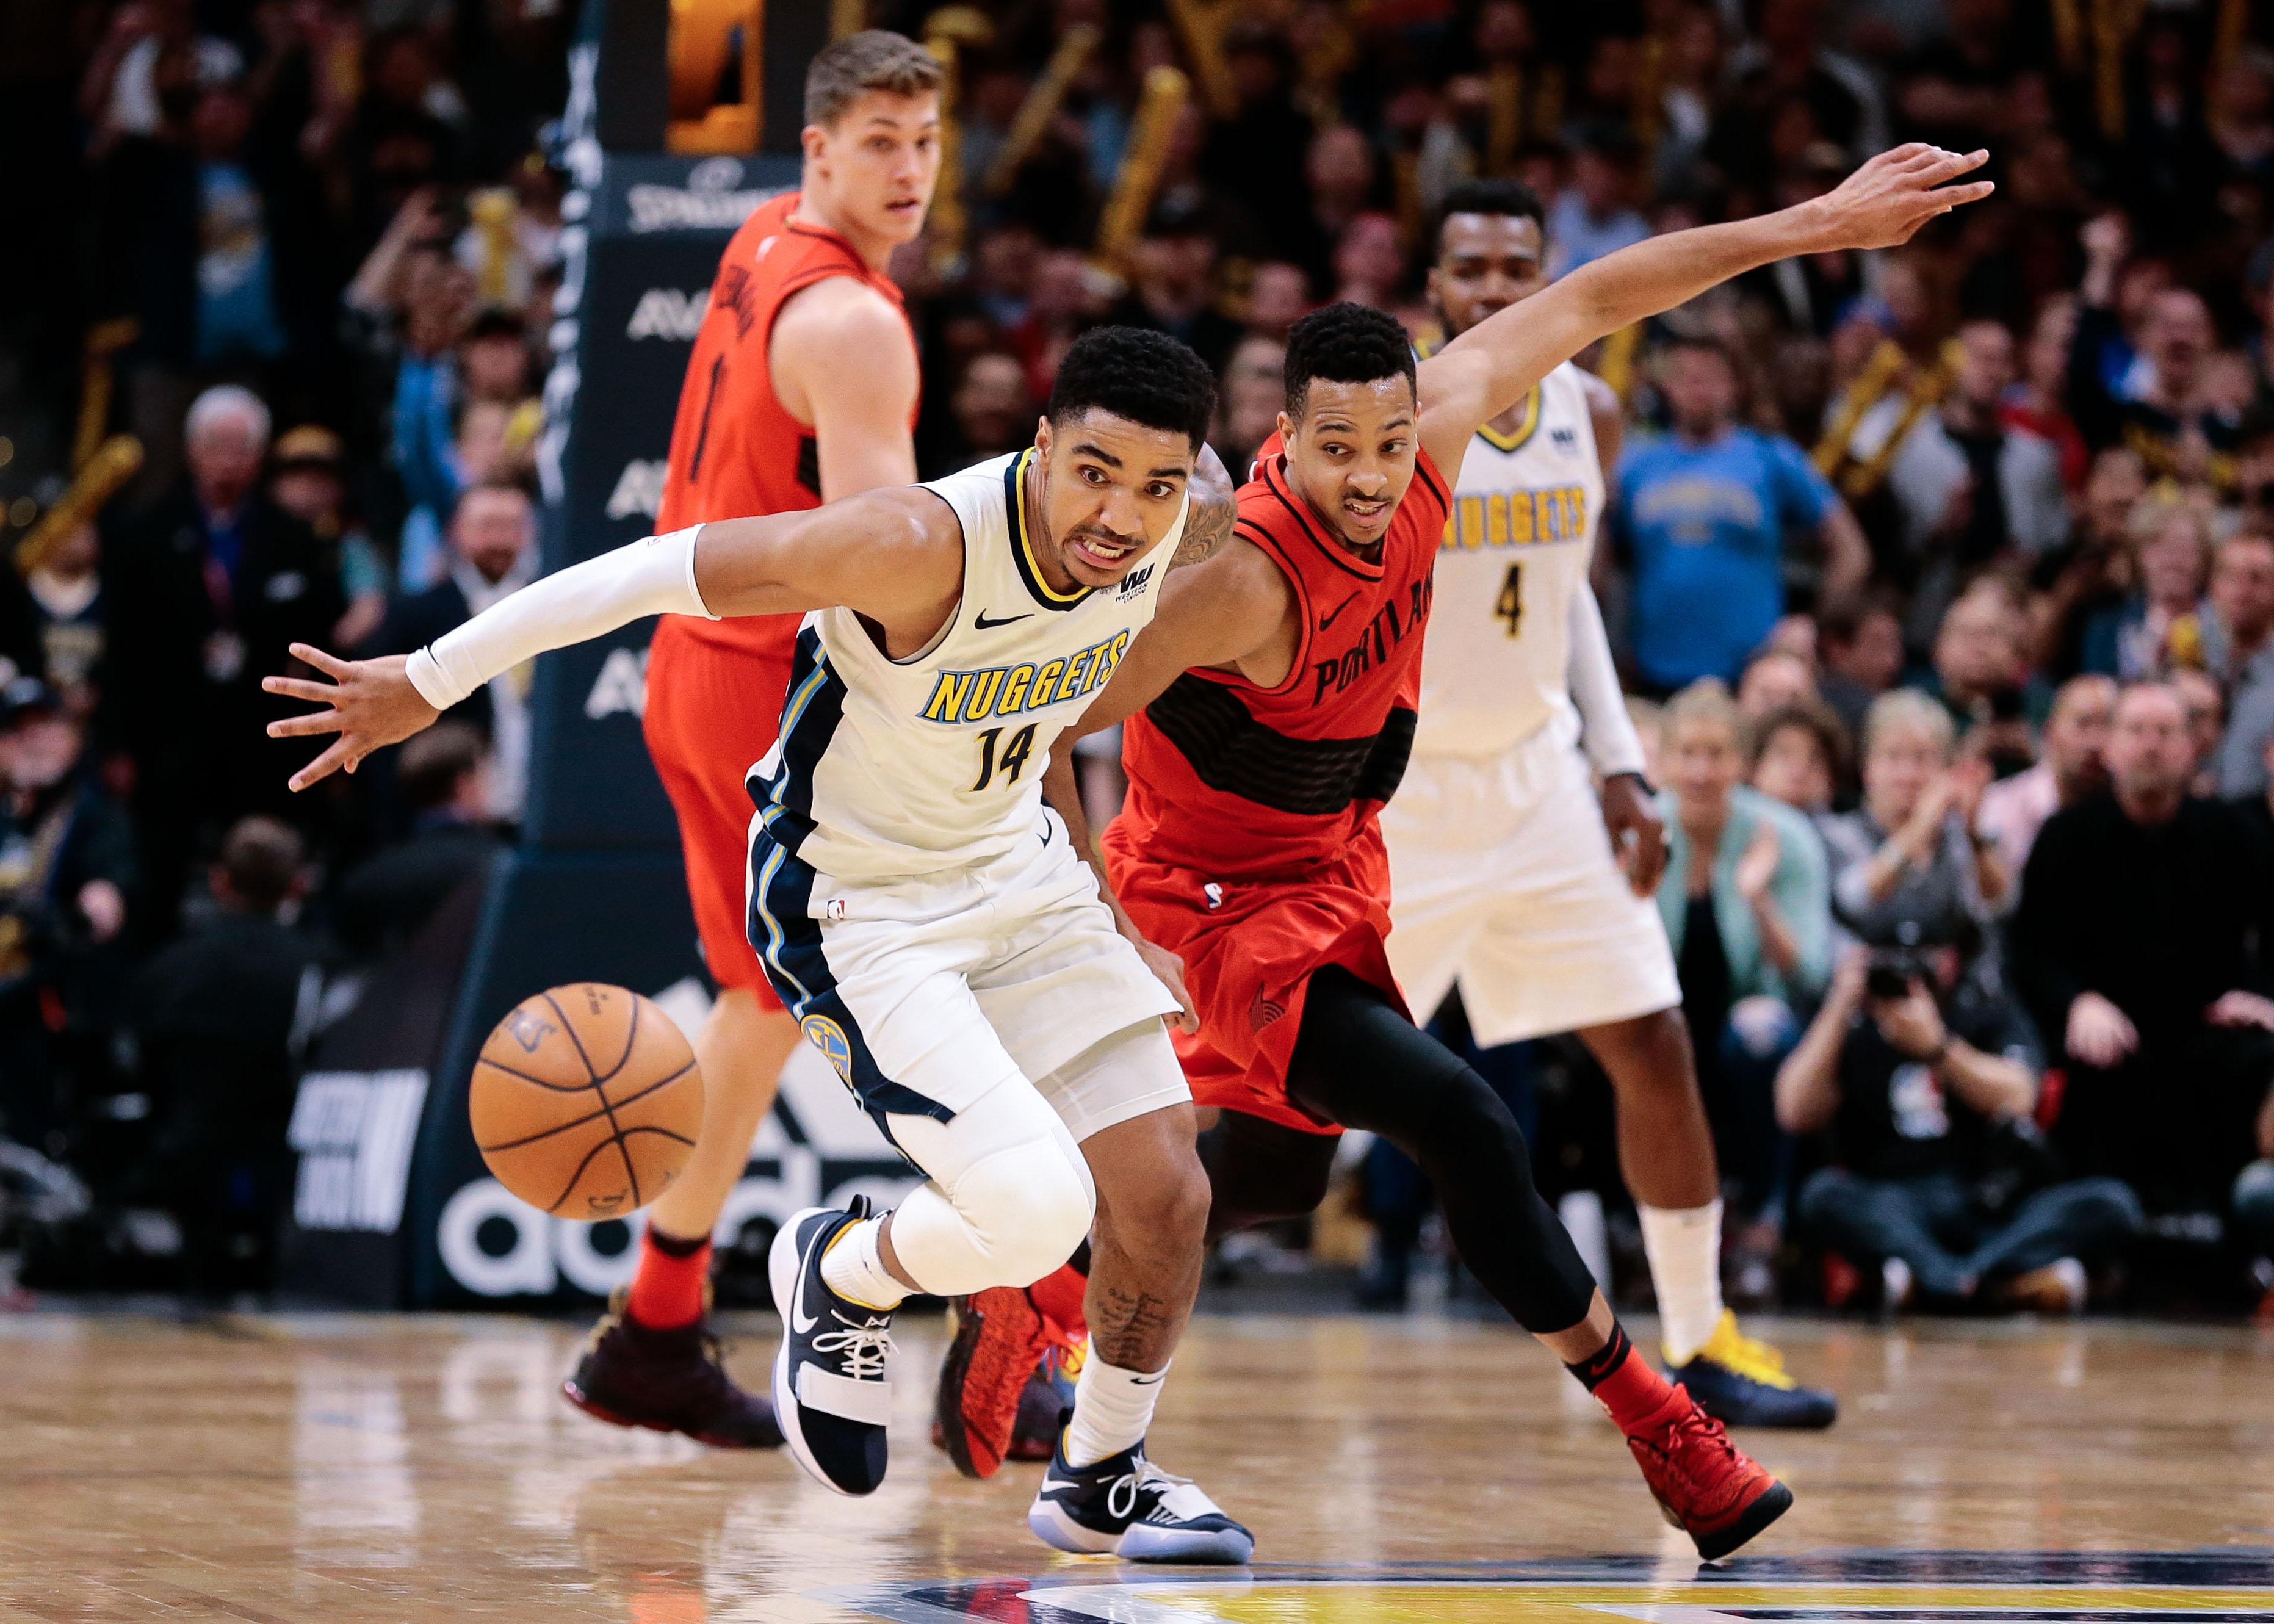 Denver Nuggets guard Gary Harris (14) and Portland Trail Blazers guard CJ McCollum (3) battle for a loose ball in the fourth quarter at the Pepsi Center.